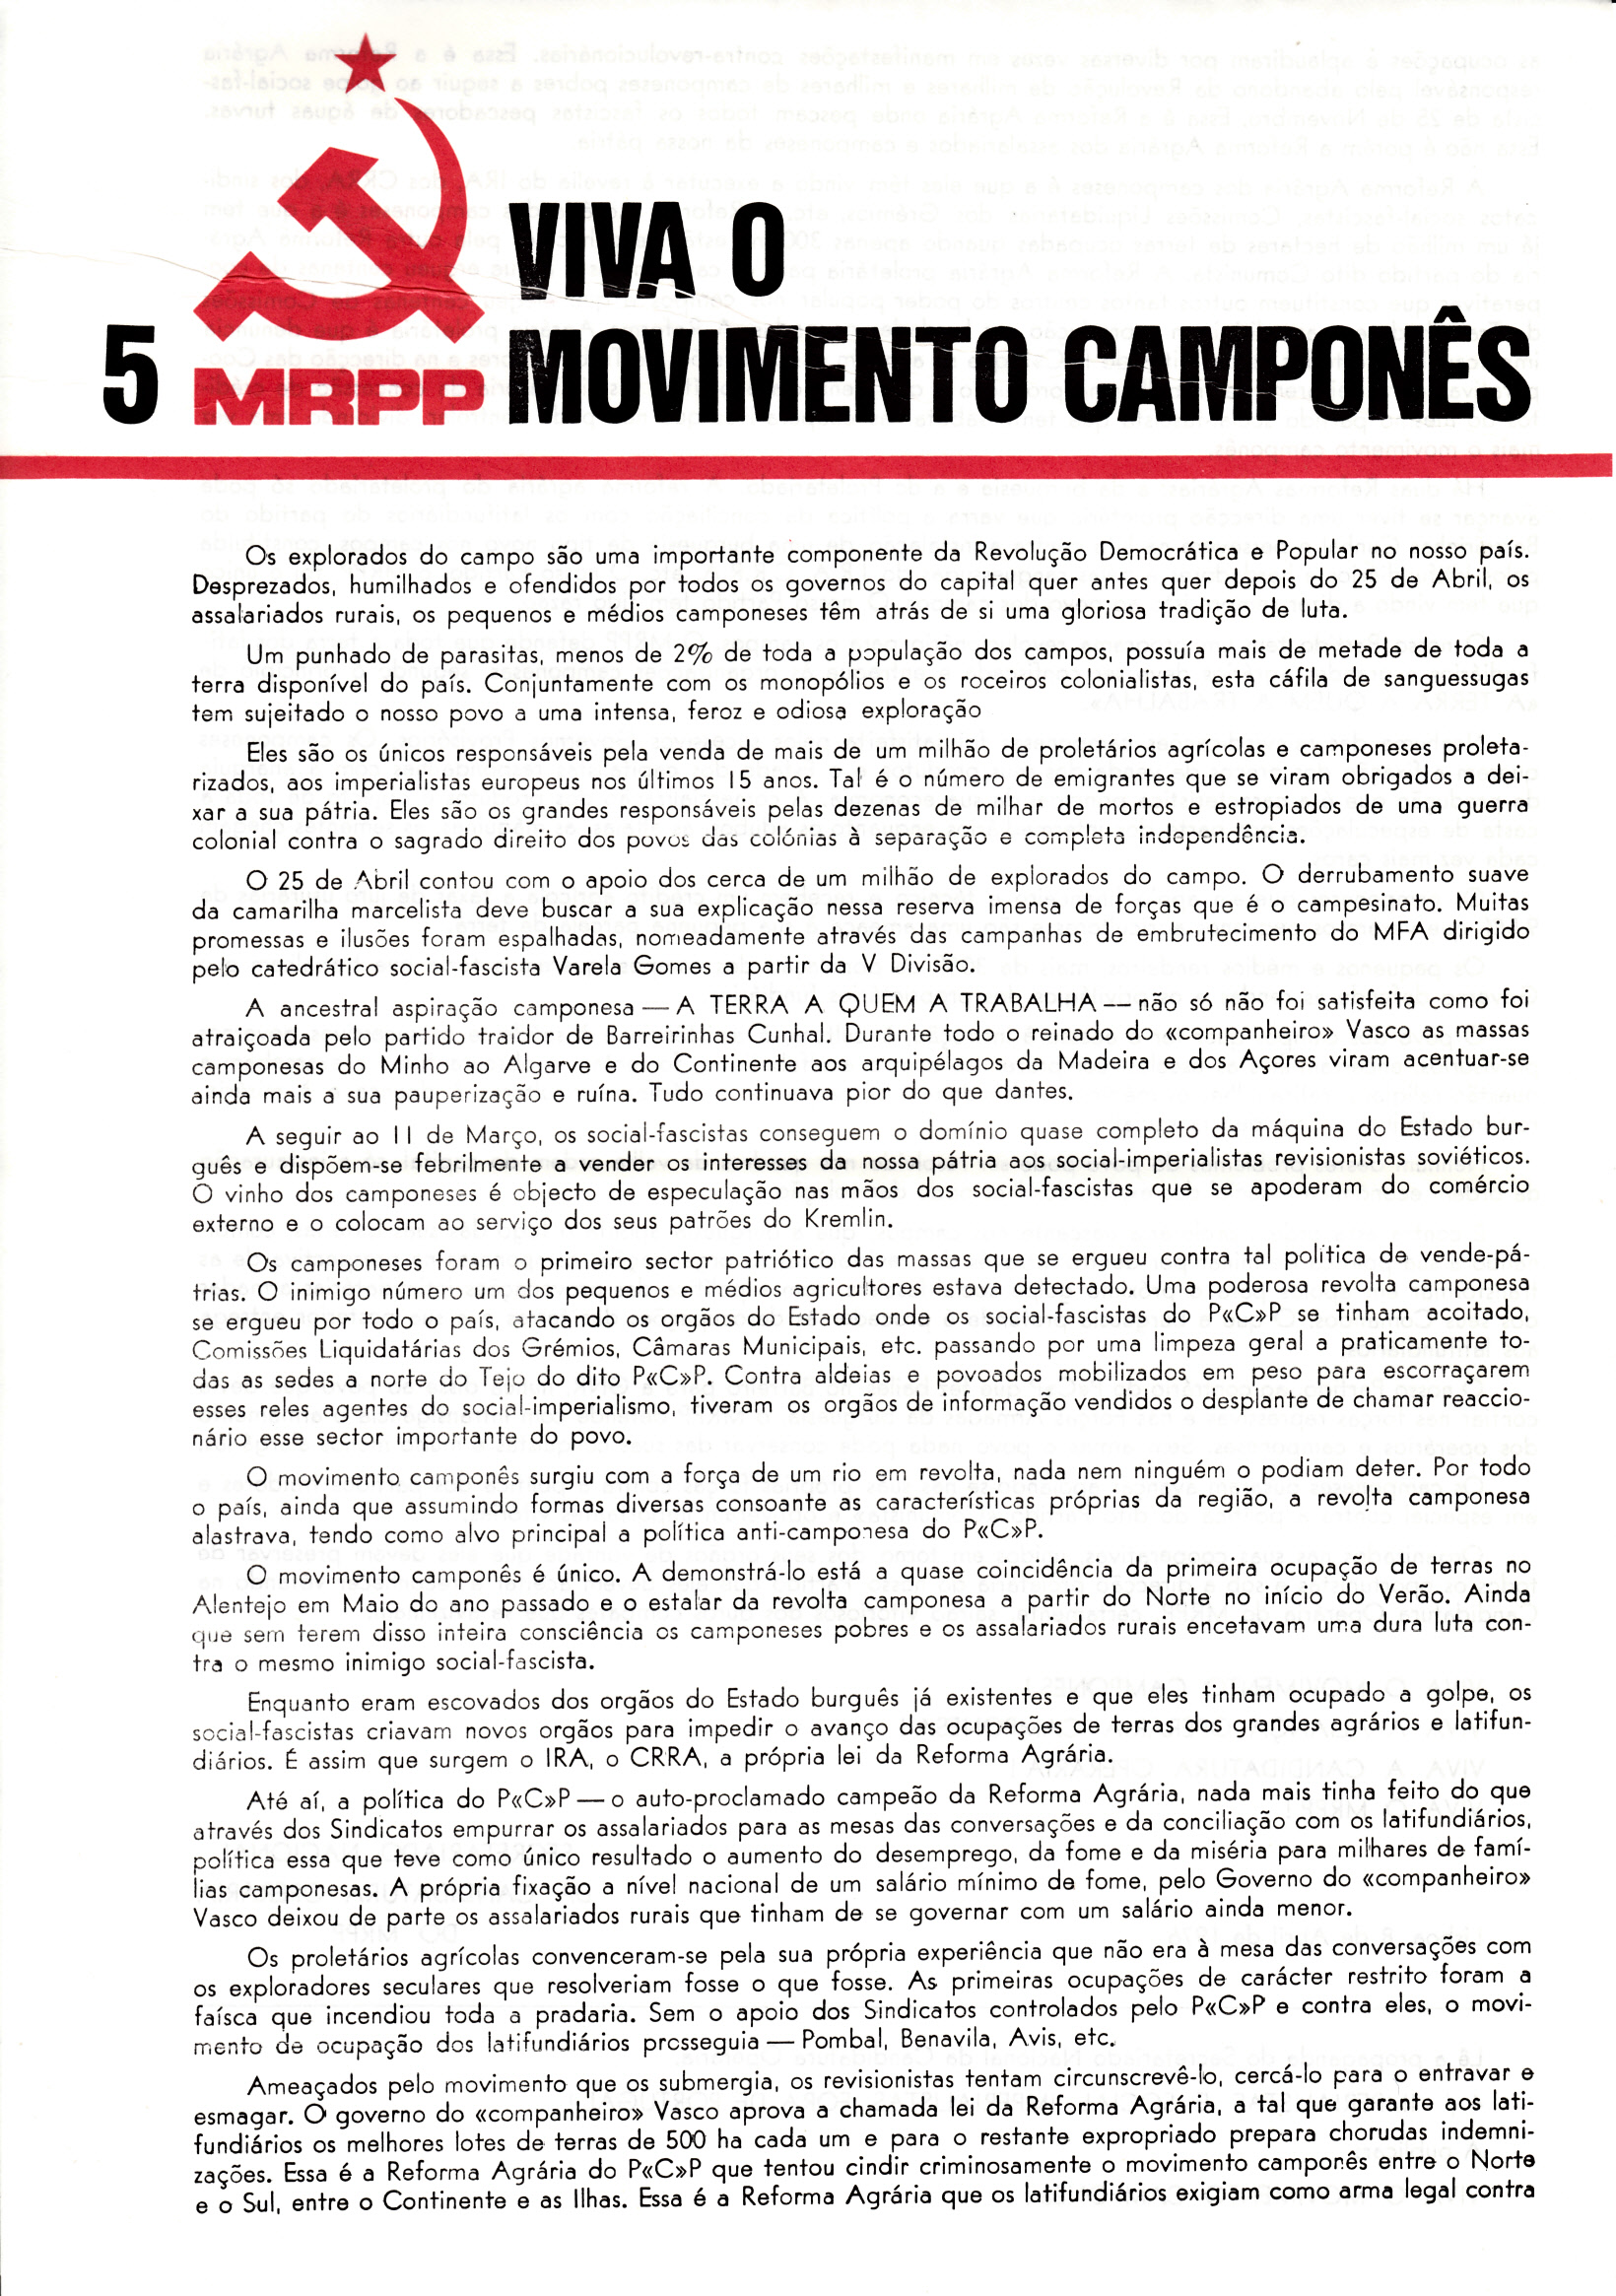 mrpp_1976_eleicao_programa_0009